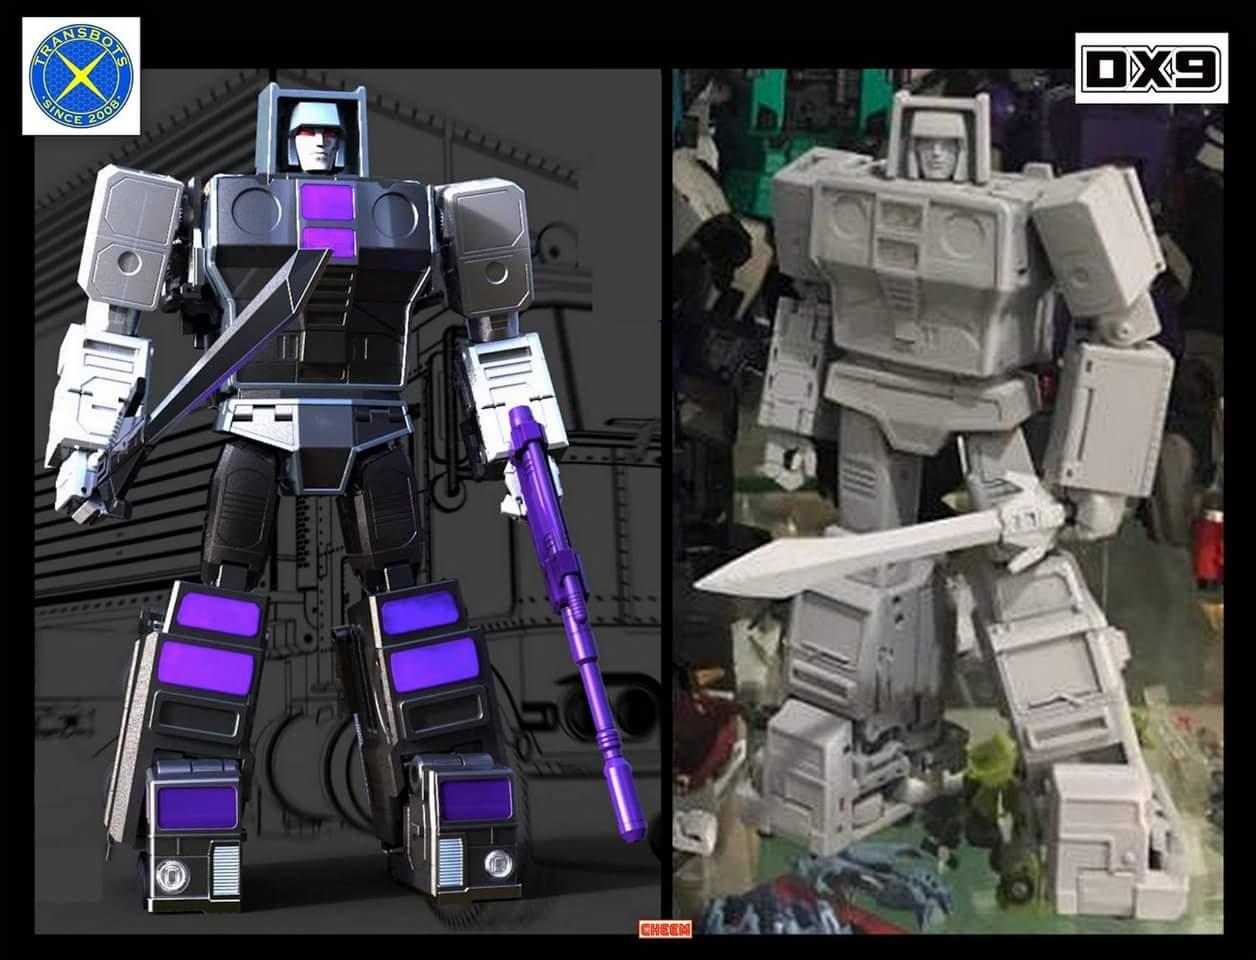 [X-Transbots] Produit Tiers - Jouets Berserkars forme Monolith (MX-XIII à MX-VII) - aka Stunticons forme Menasor/Menaseur - Page 3 RPskBtee_o